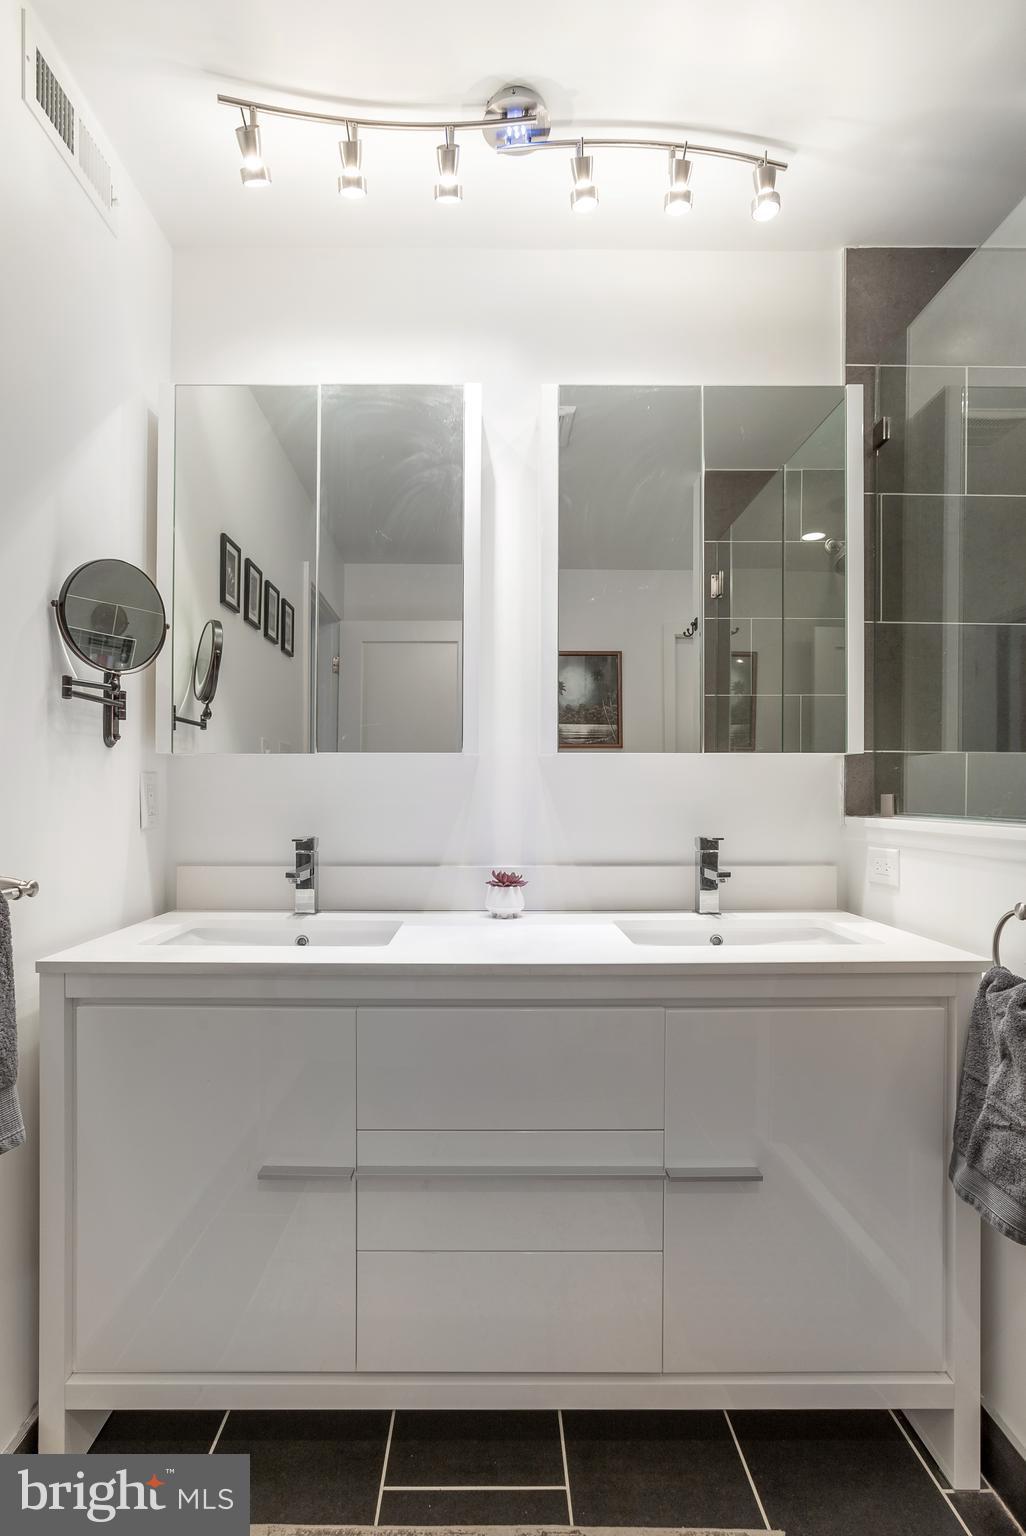 For Sale 727 N 20 Th Street 4 Philadelphia Pa 19130 2 Beds 2 Full Baths 1 Half Bath 529900